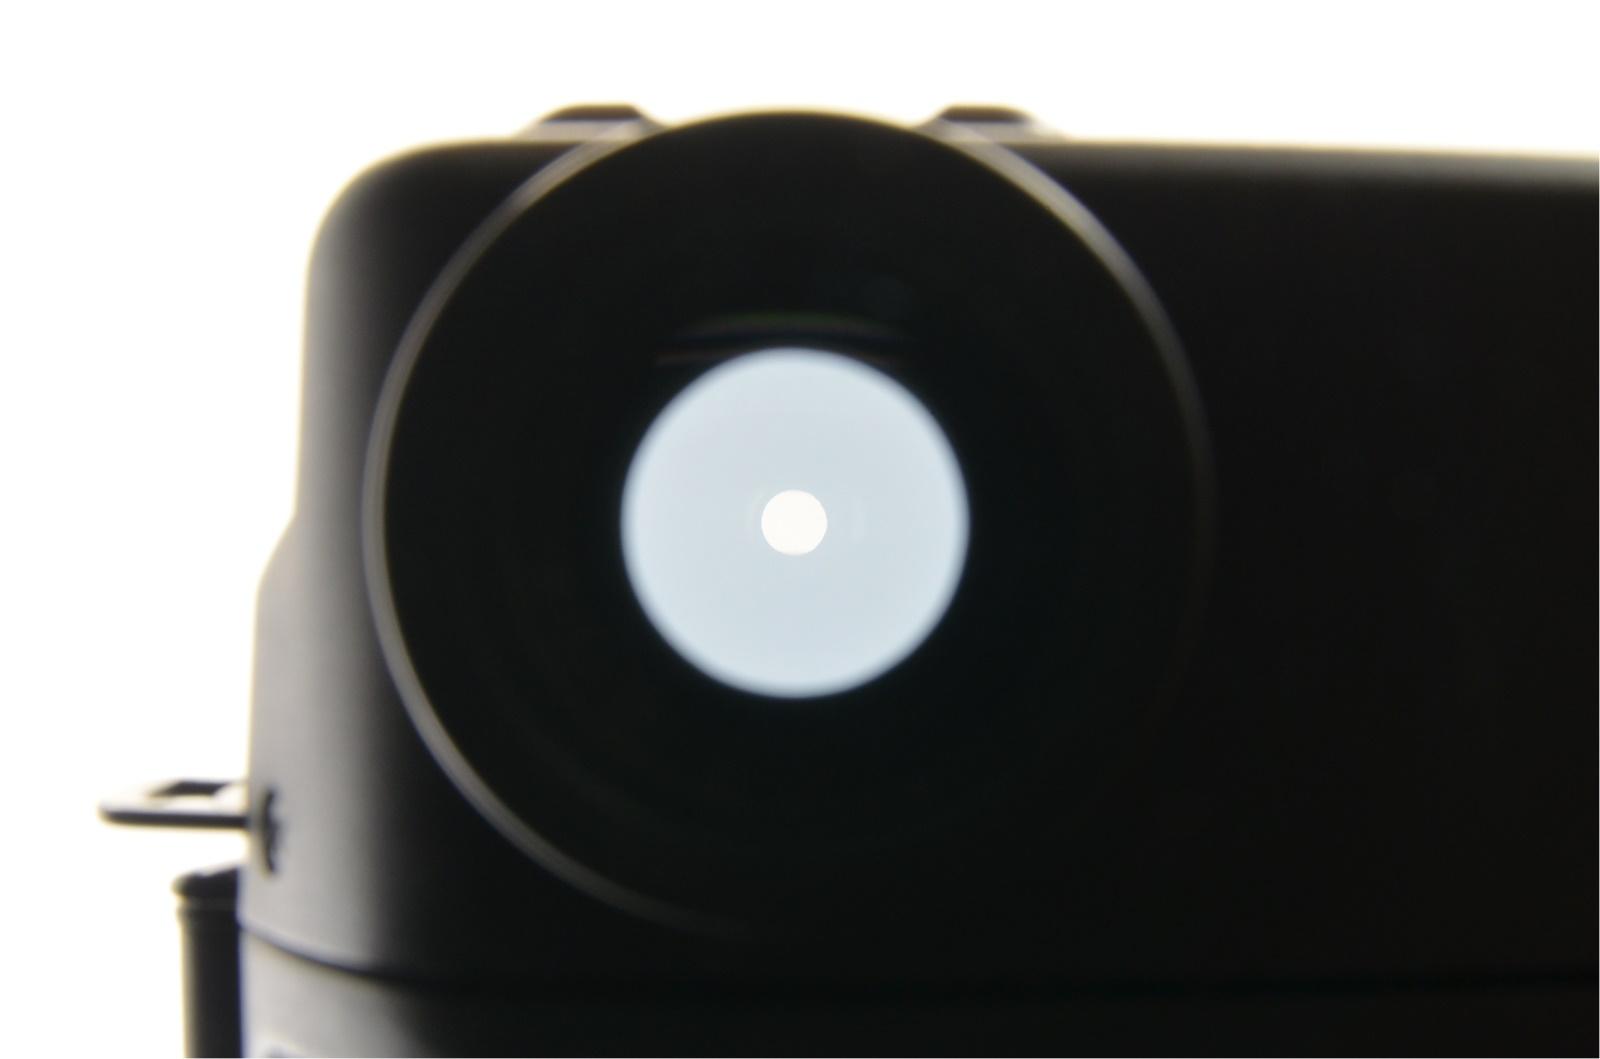 fuji fujifilm gw680iii 90mm f3.5 count 027 medium format camera shooting tested